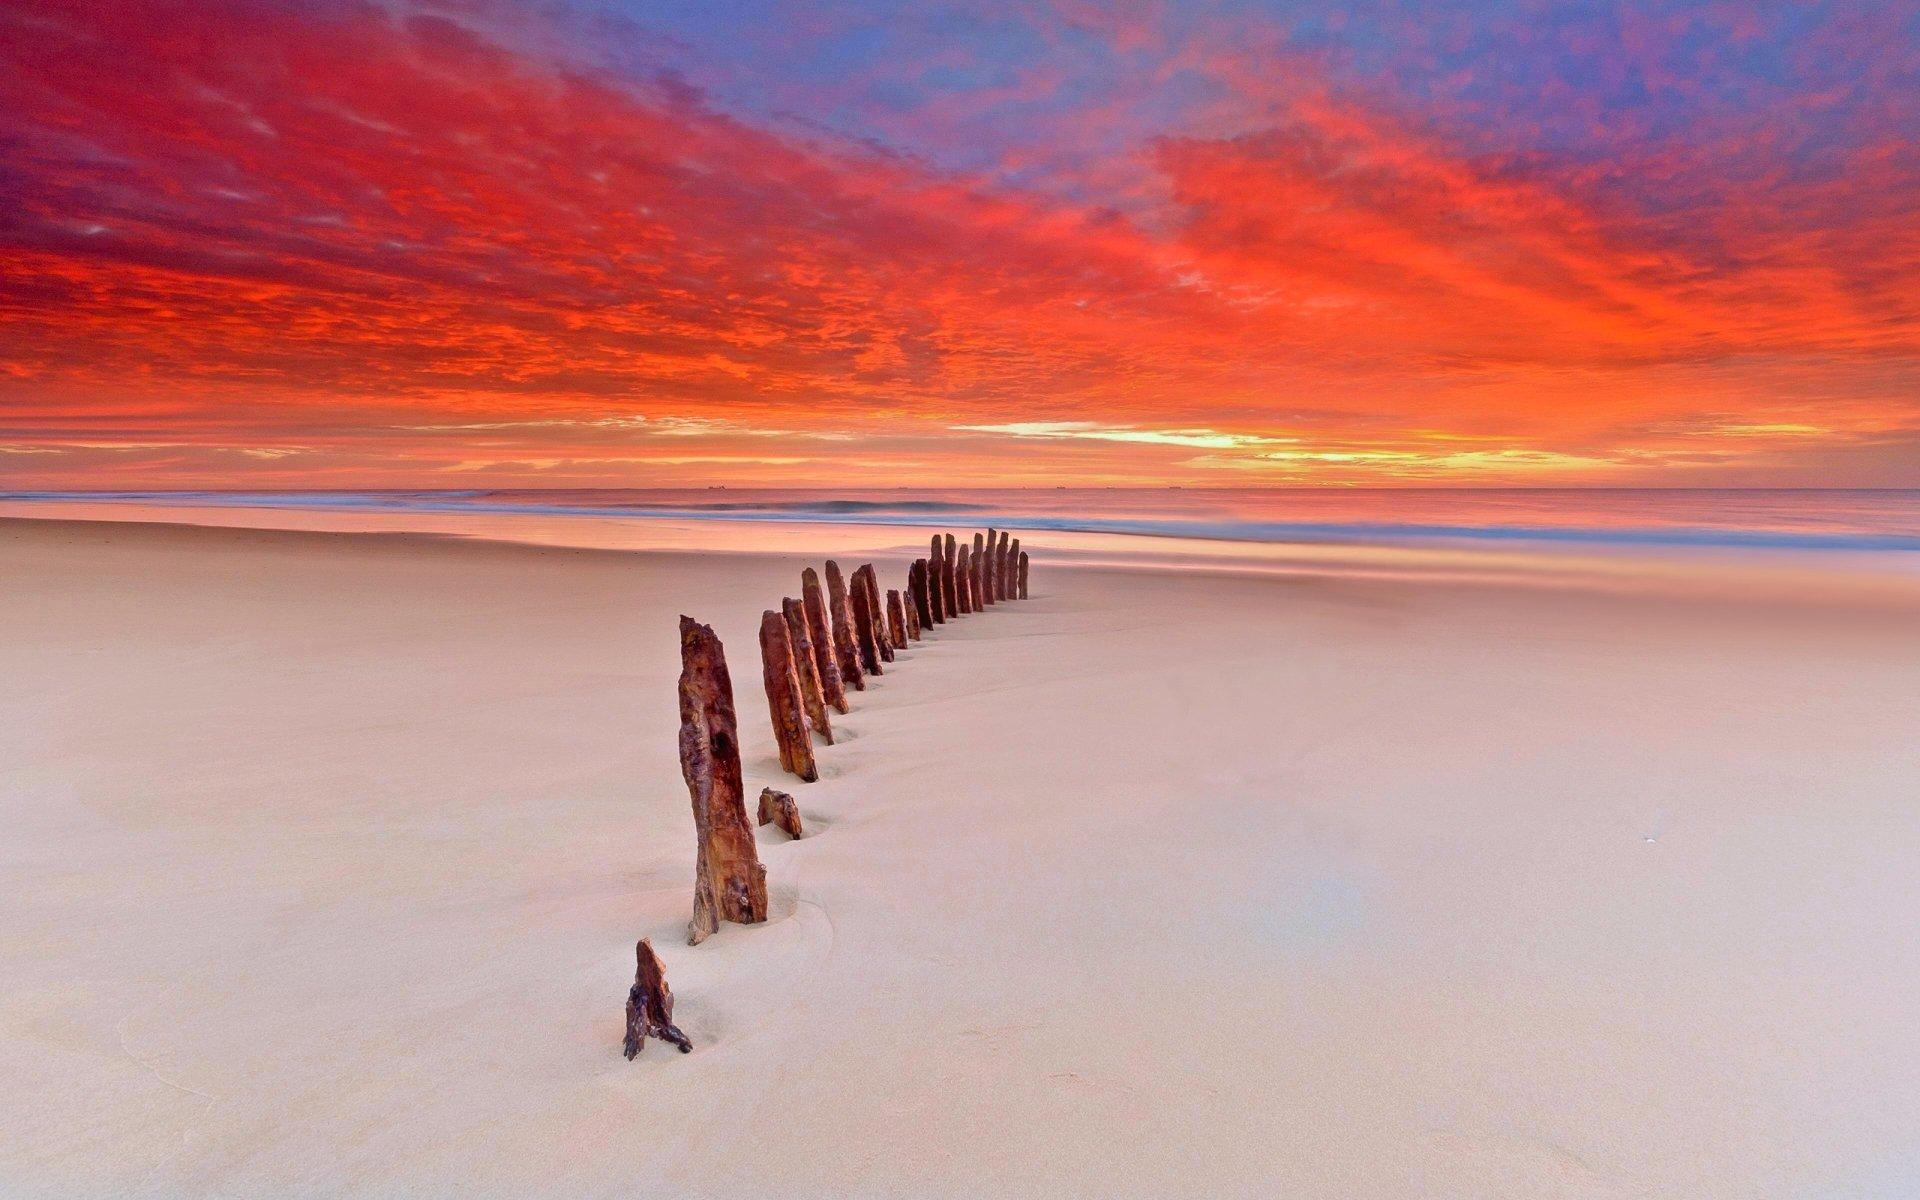 Earth - Scenic  Sand Sunset Horizon Sky Cloud Beach Nature Wallpaper